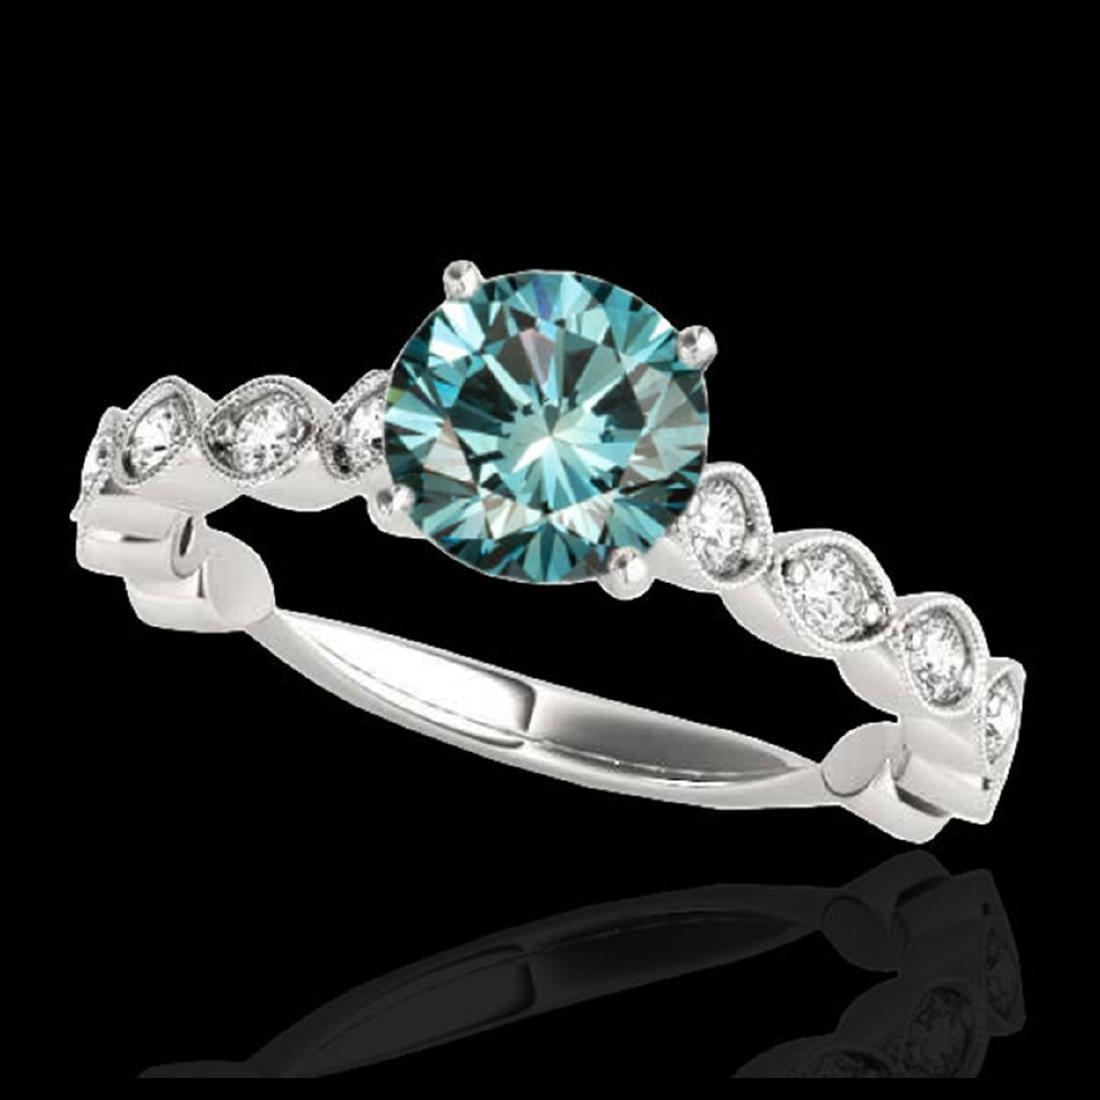 1.75 ctw SI Fancy Blue Diamond Solitaire Ring 10K White